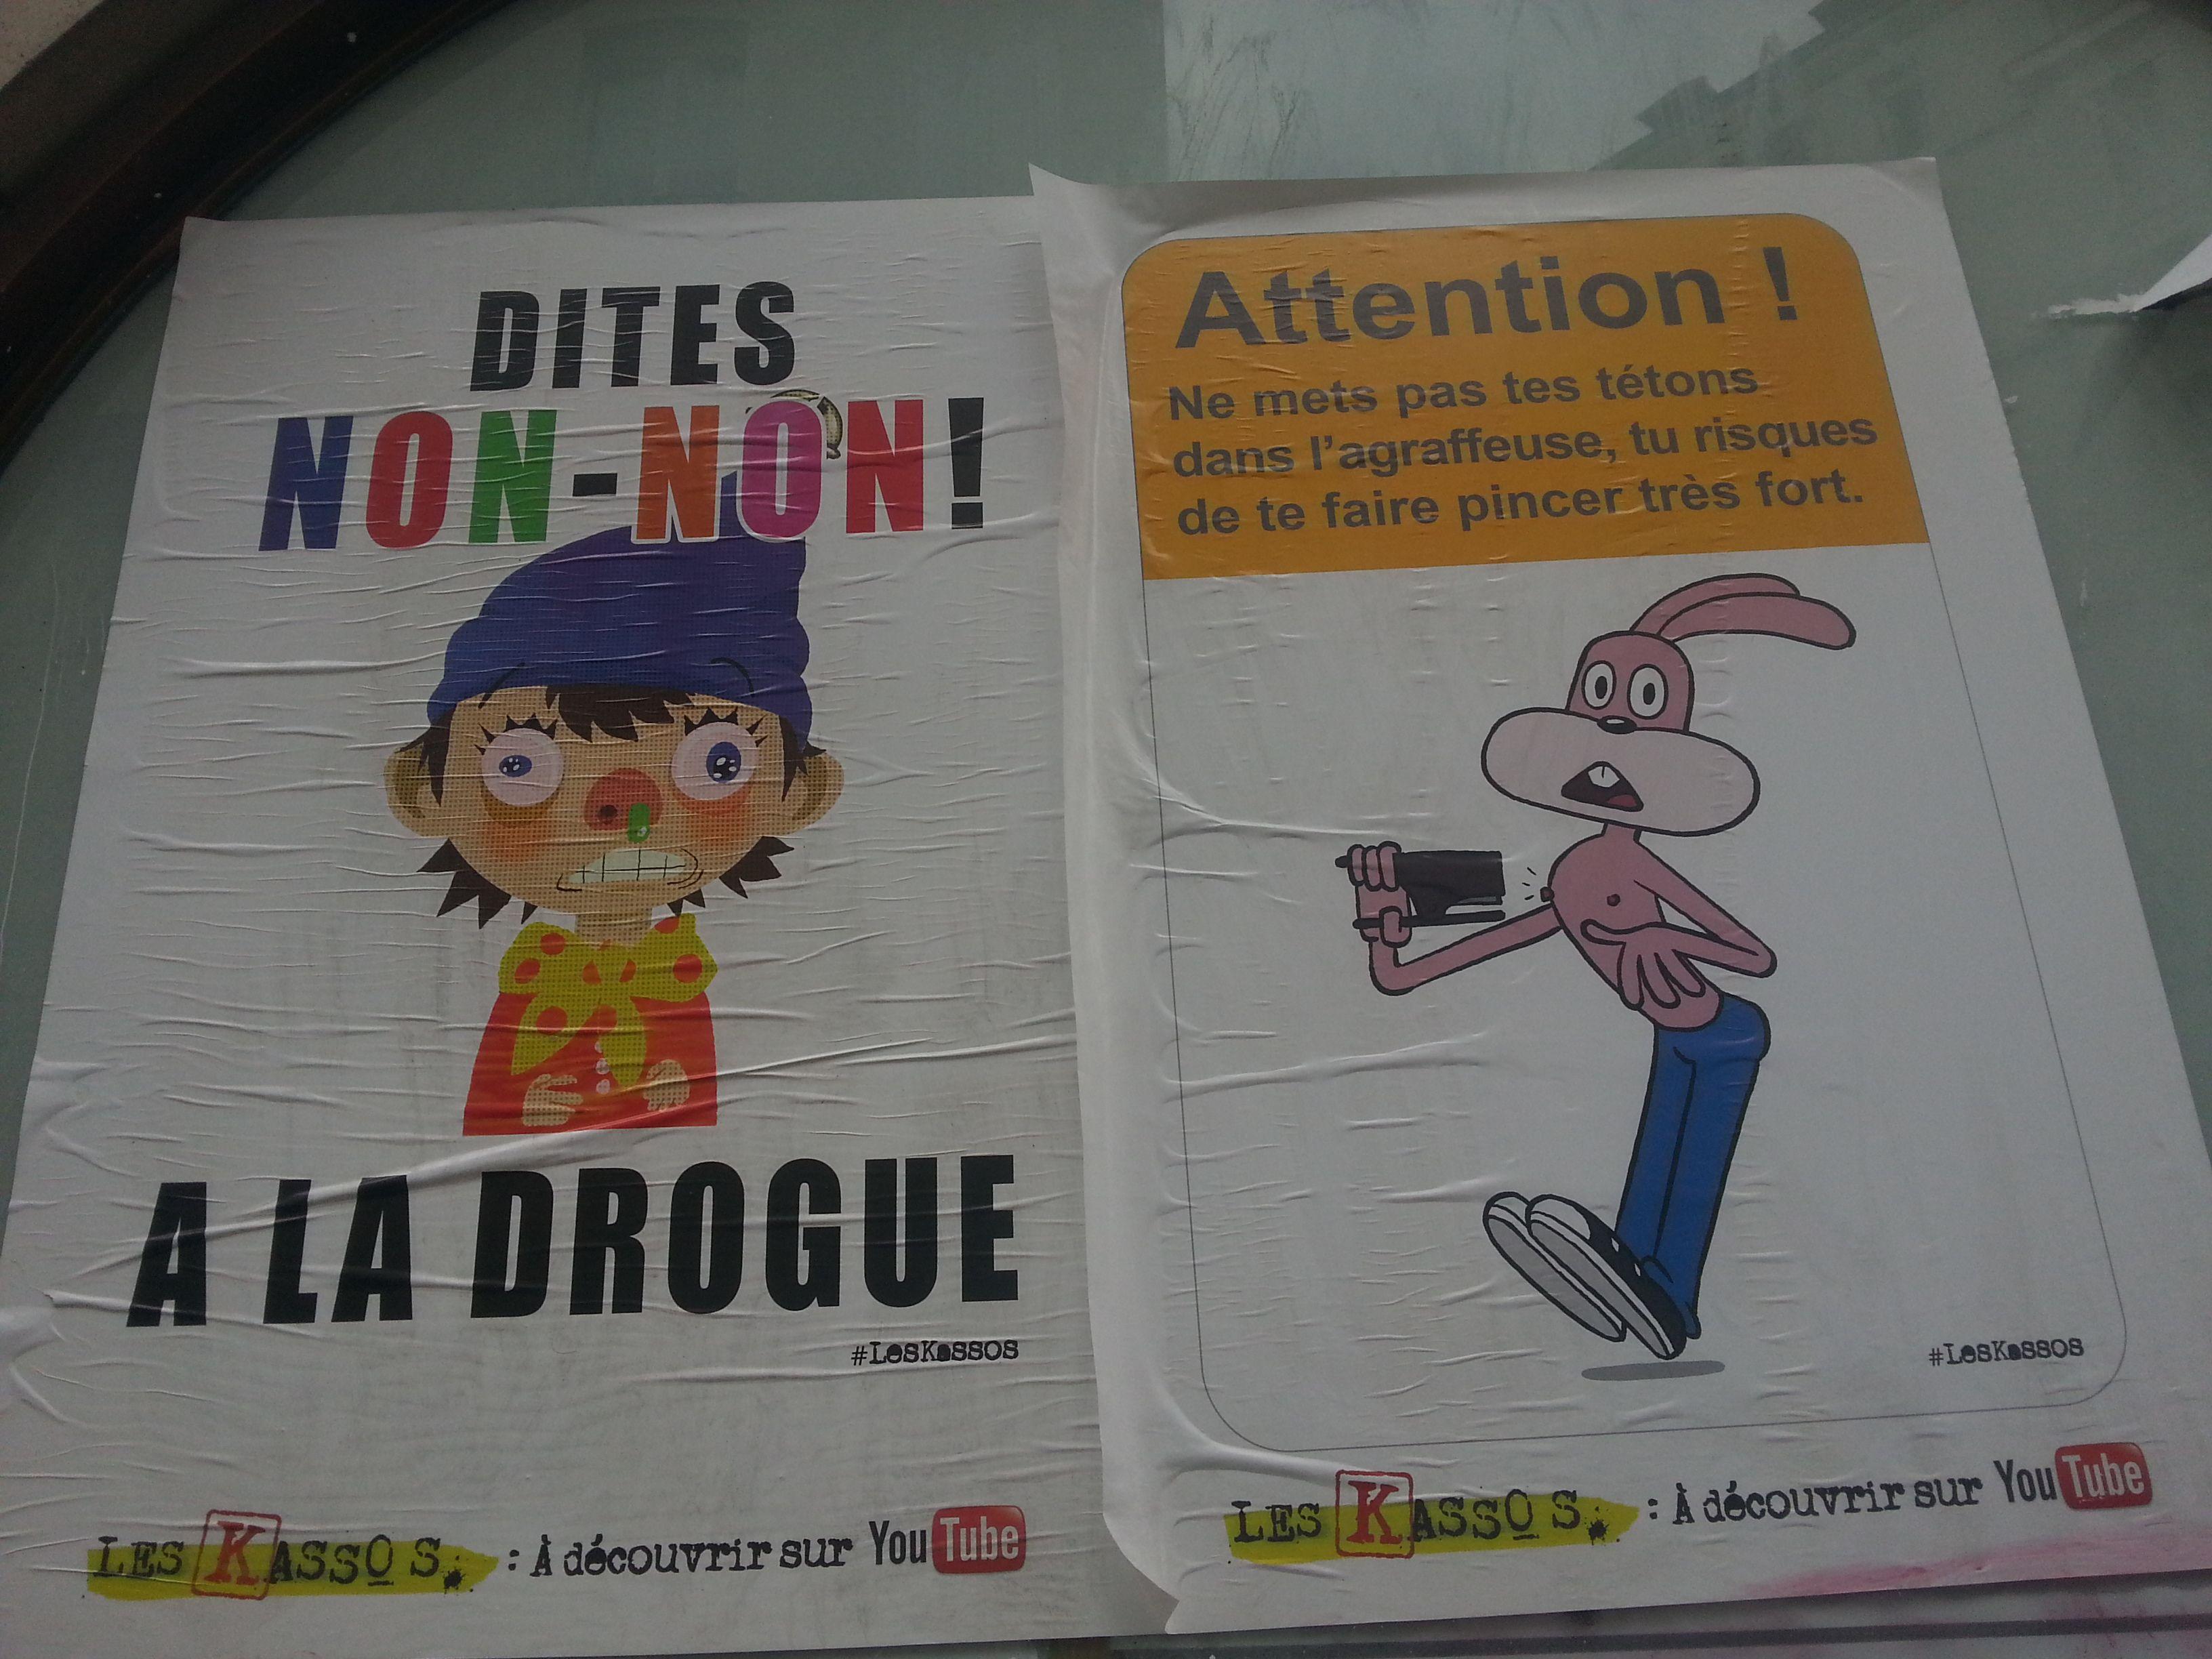 #drogues #drugs #humour #affiche #lol #photo